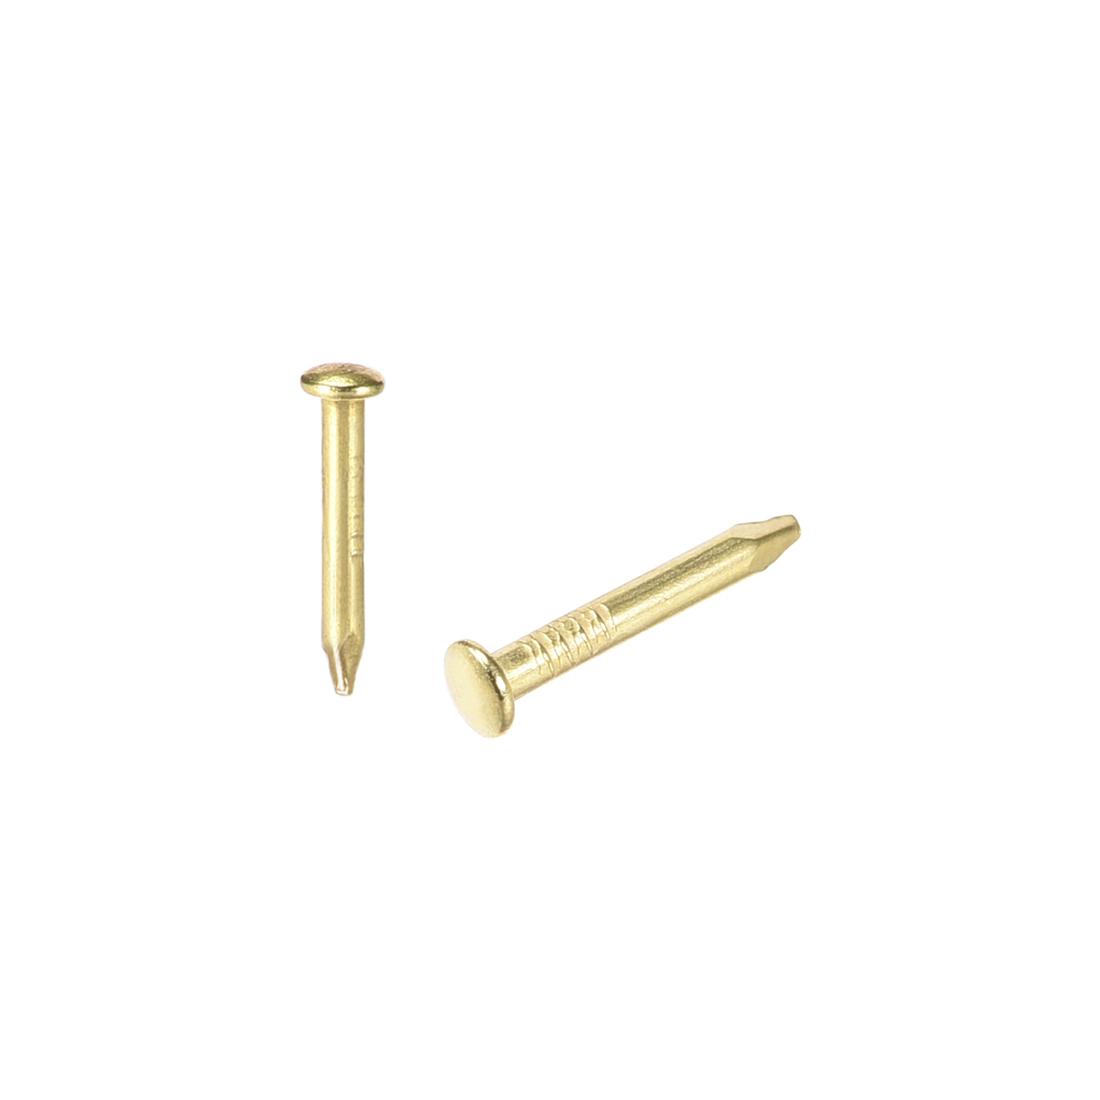 Small Tiny Nails 1.5X10mm for DIY Decorative Accessories Gold Tone 300pcs